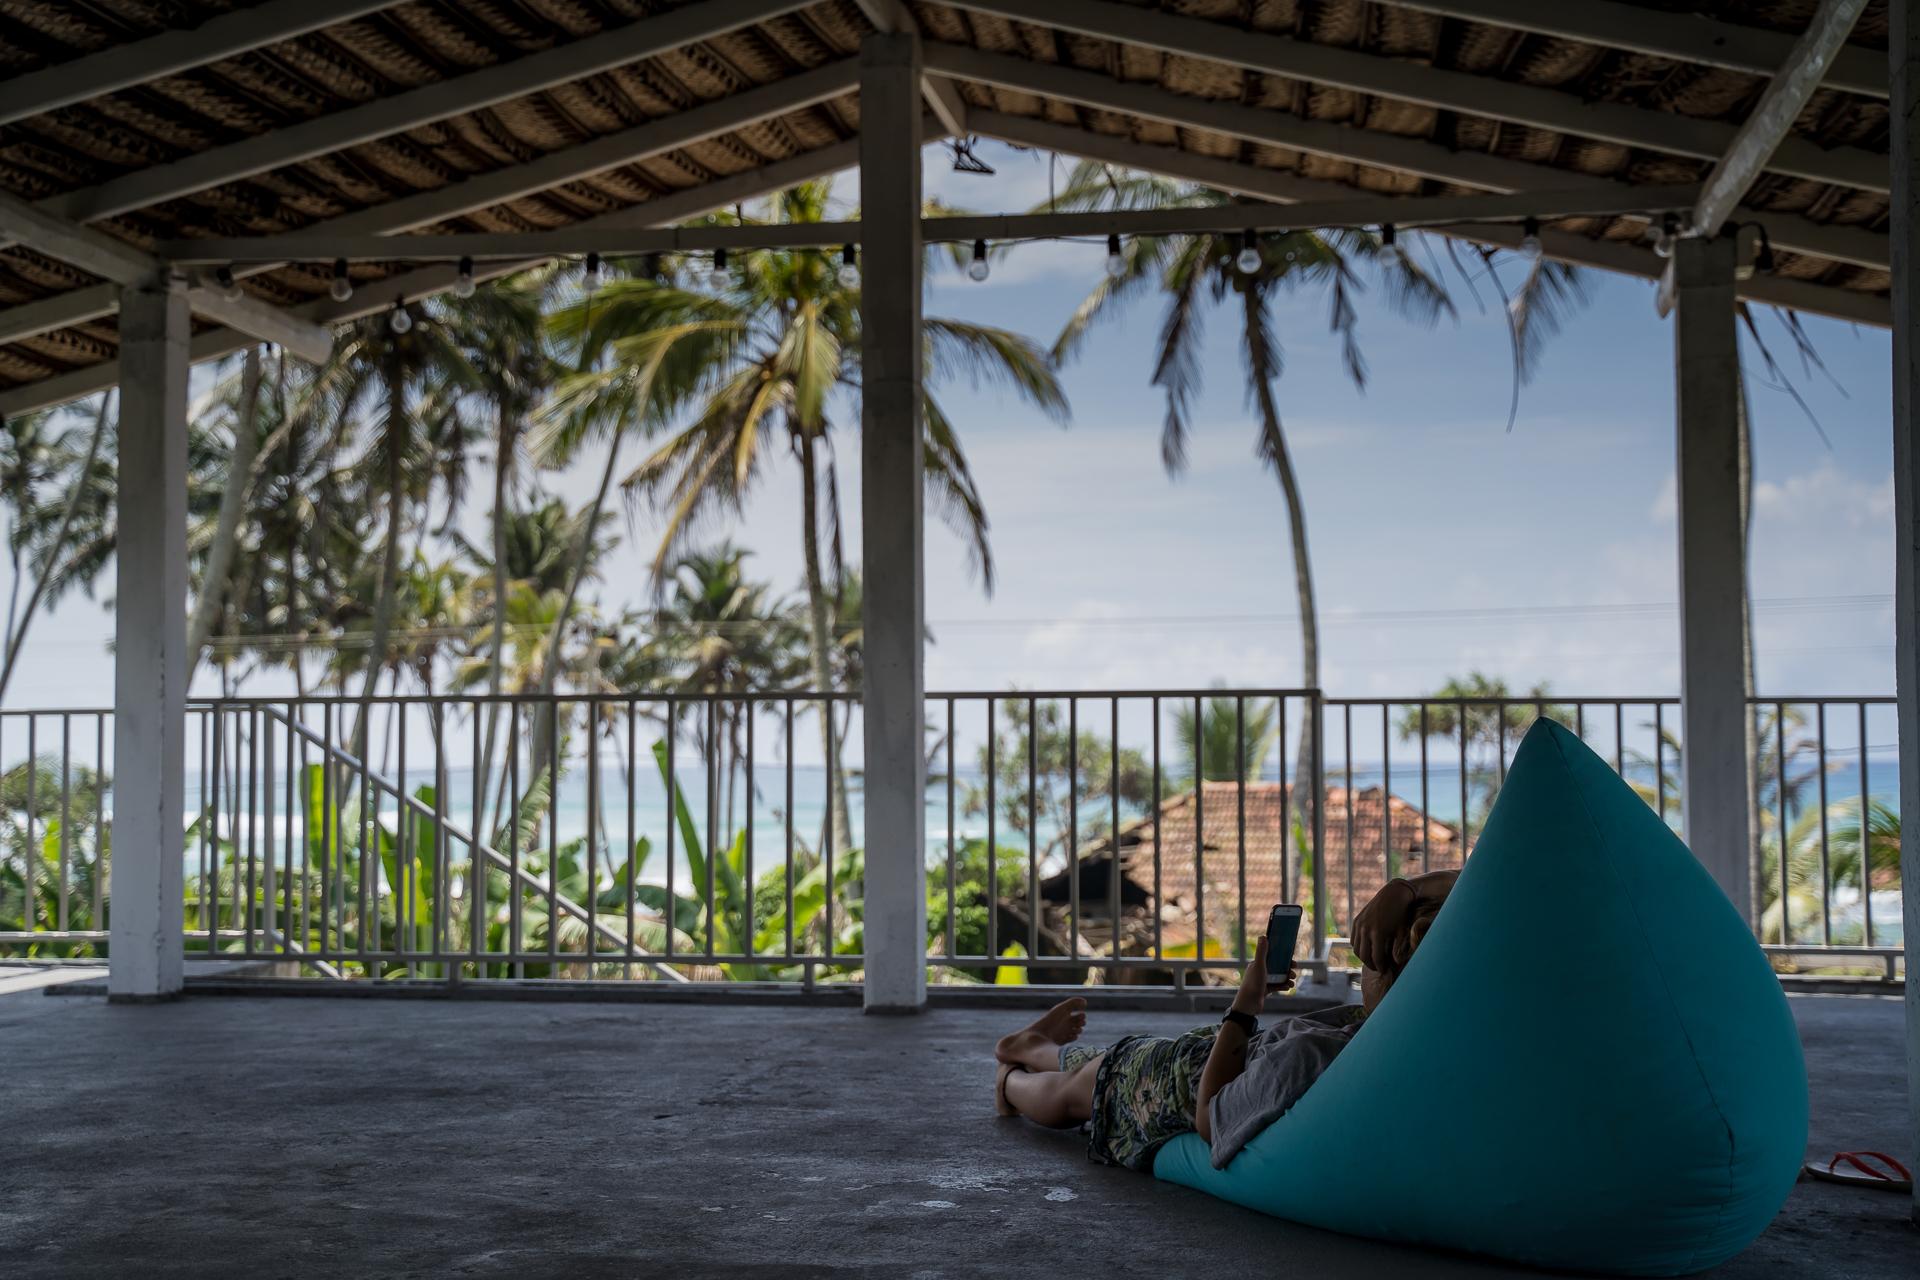 20191017 - Sri Lanka surf theory & lifes